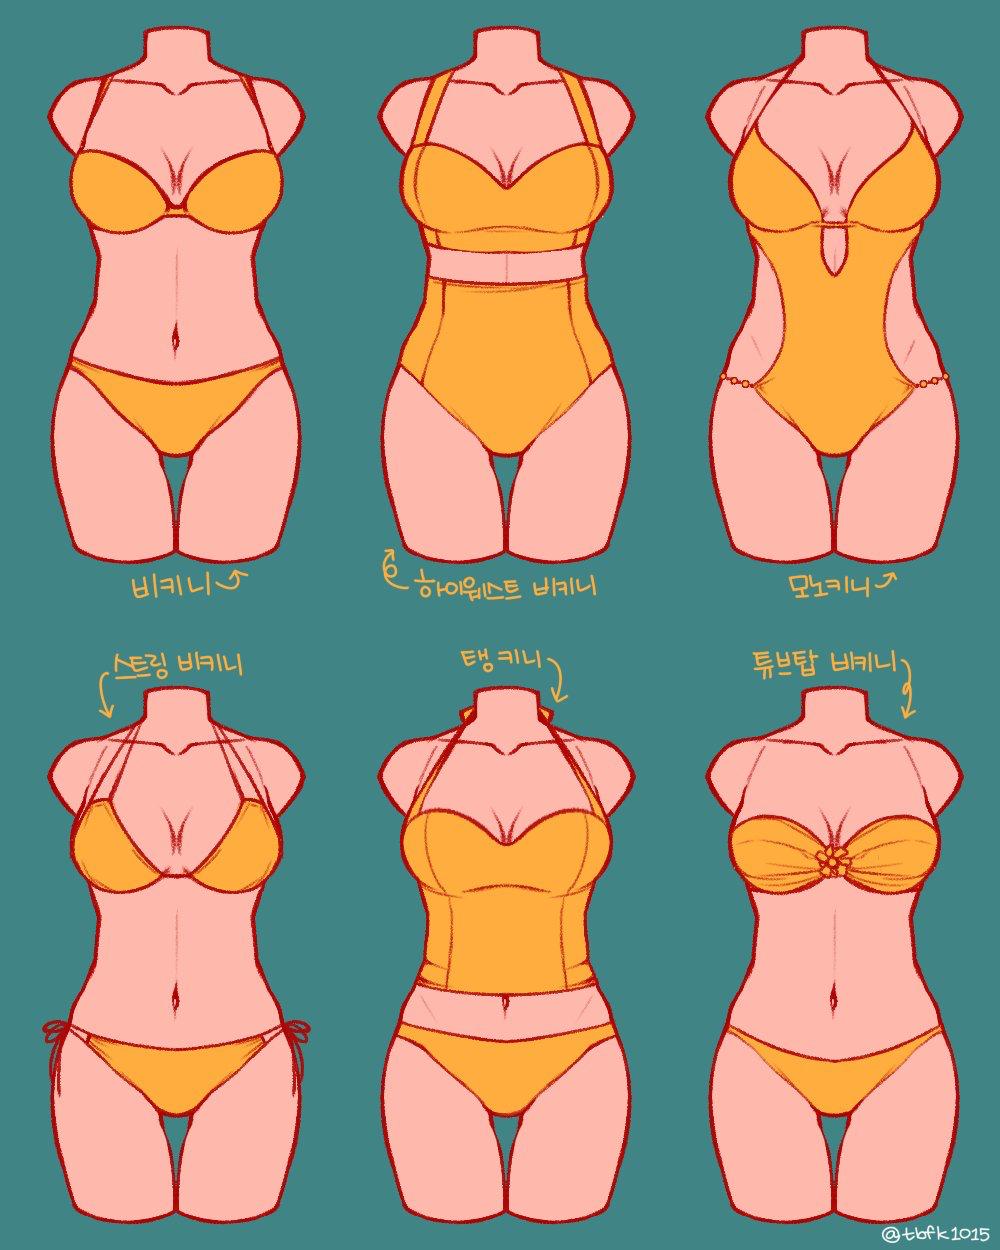 Swimsuit Traje De Bano Bocetos Ropa Dibujo Dibujos